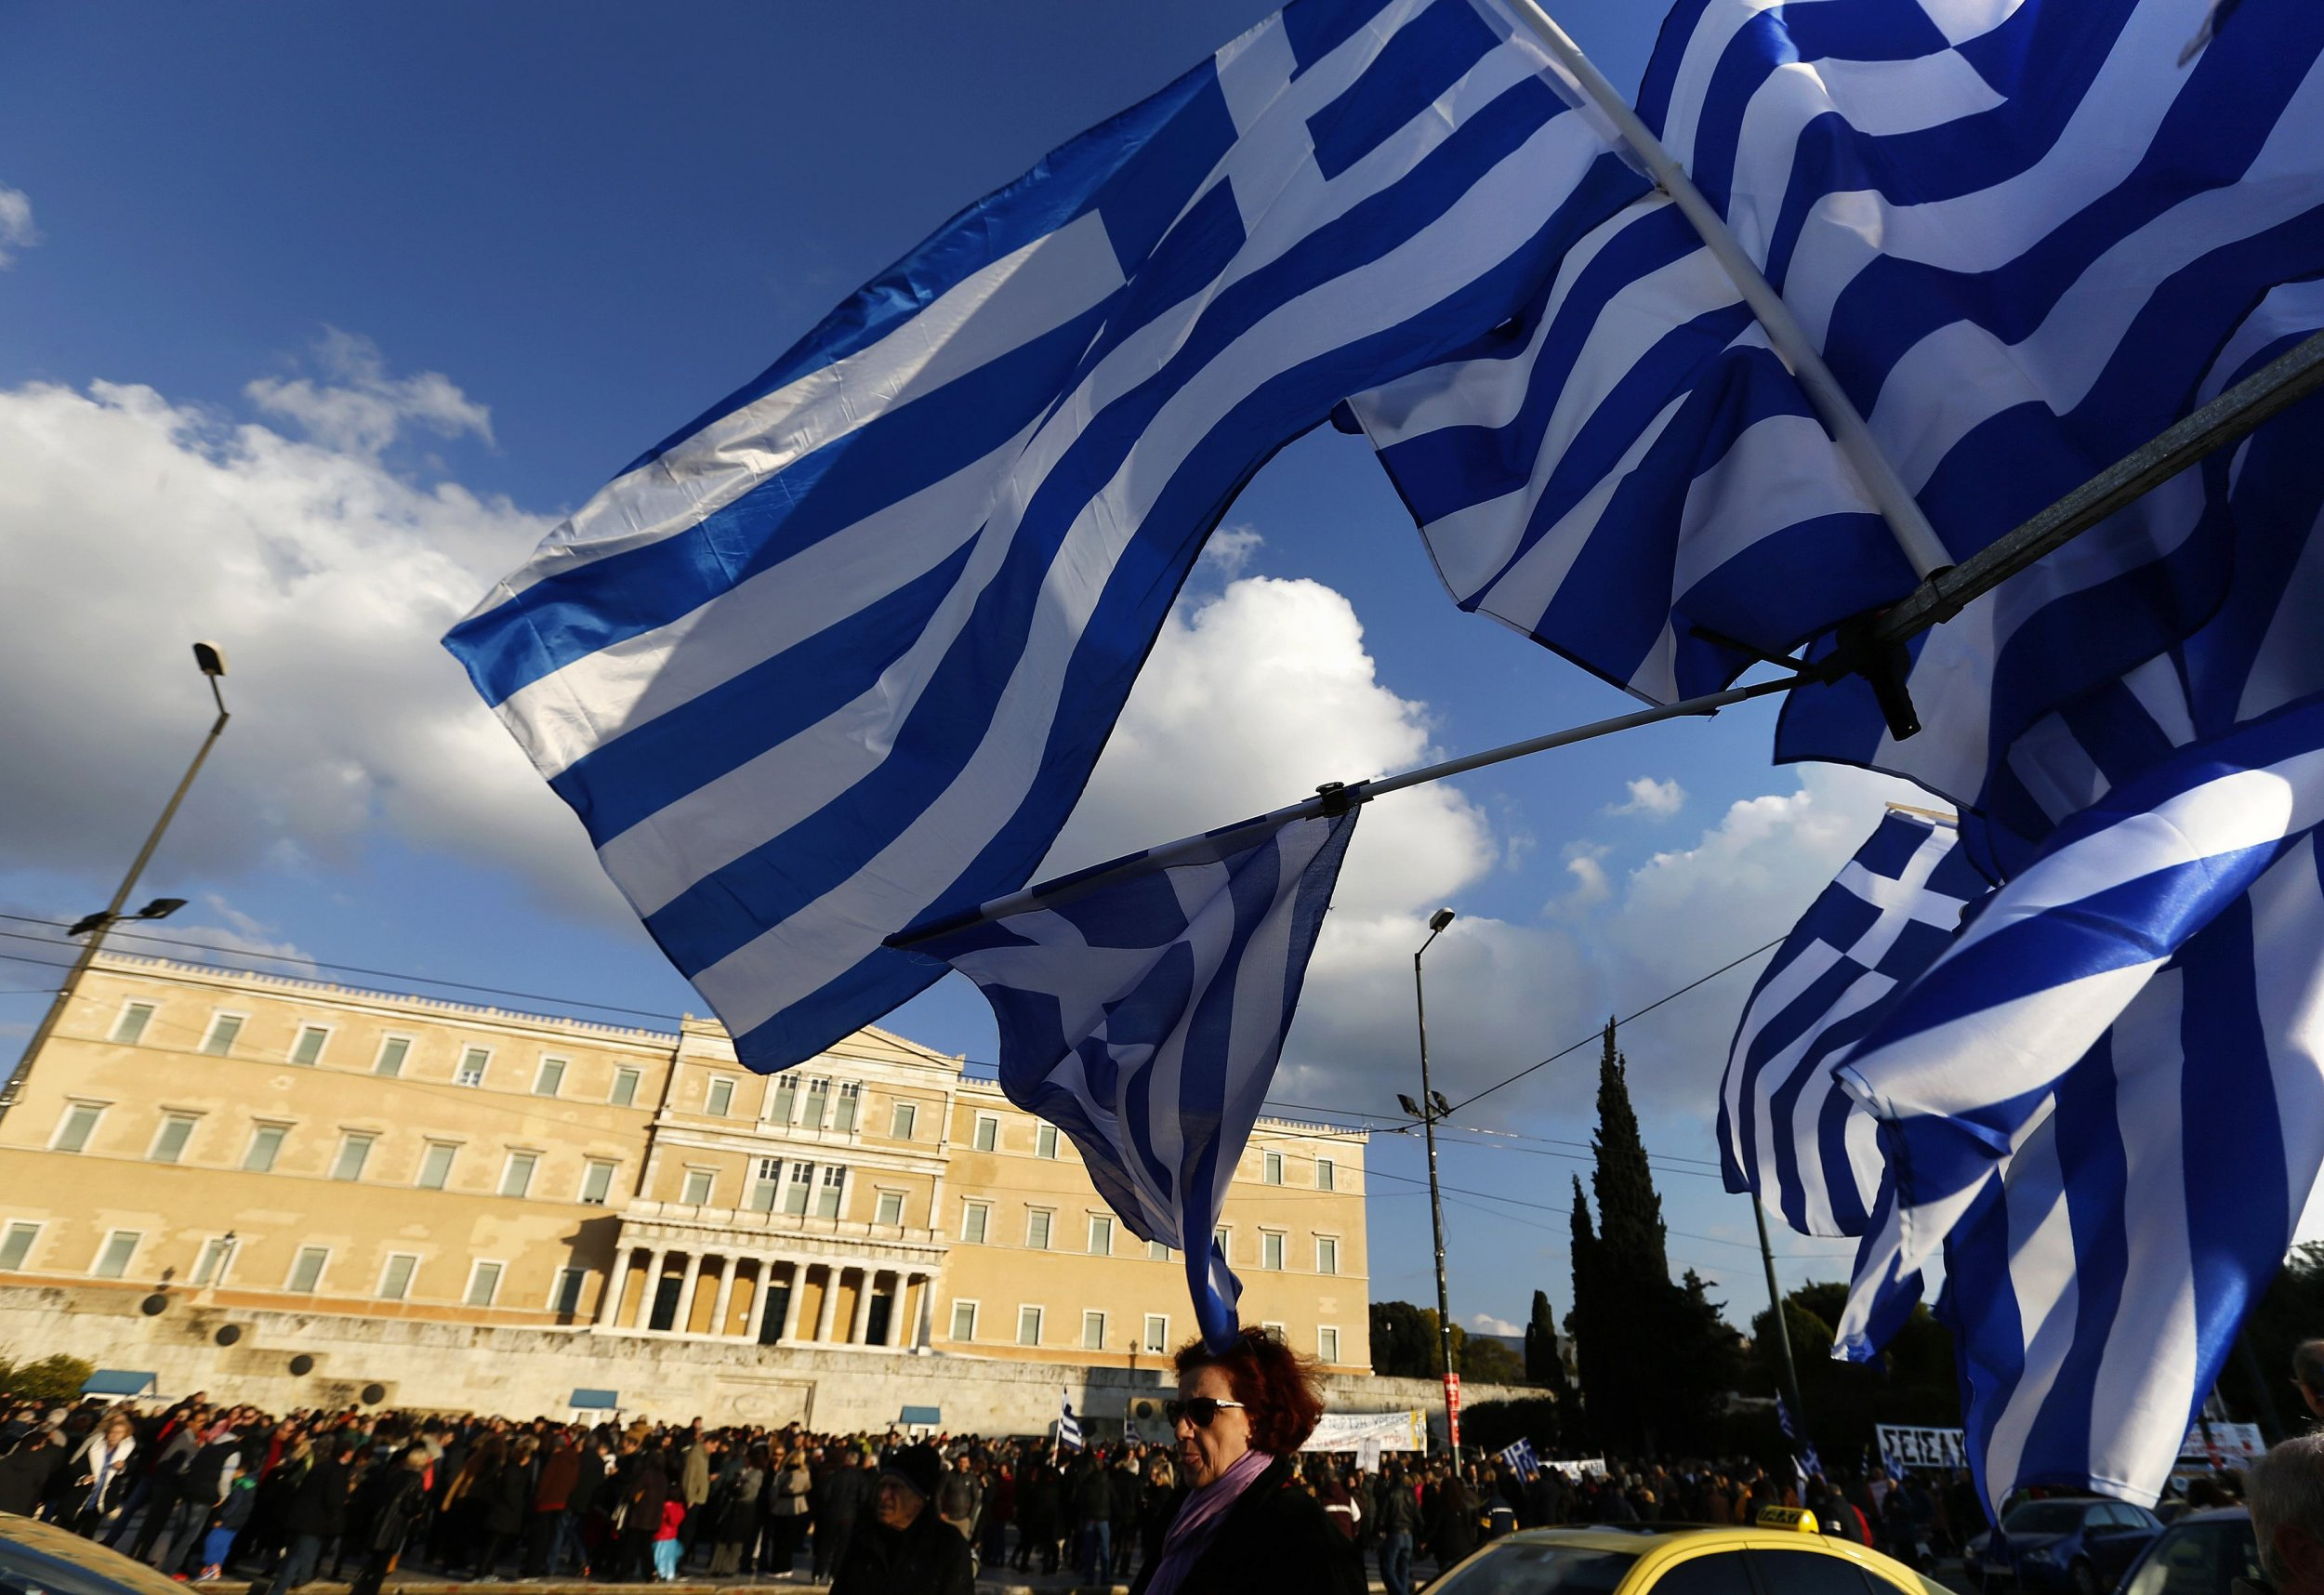 2015-02-15T175608Z_557636177_GM1EB2G05AV01_RTRMADP_3_EUROZONE-GREECE-PROTEST